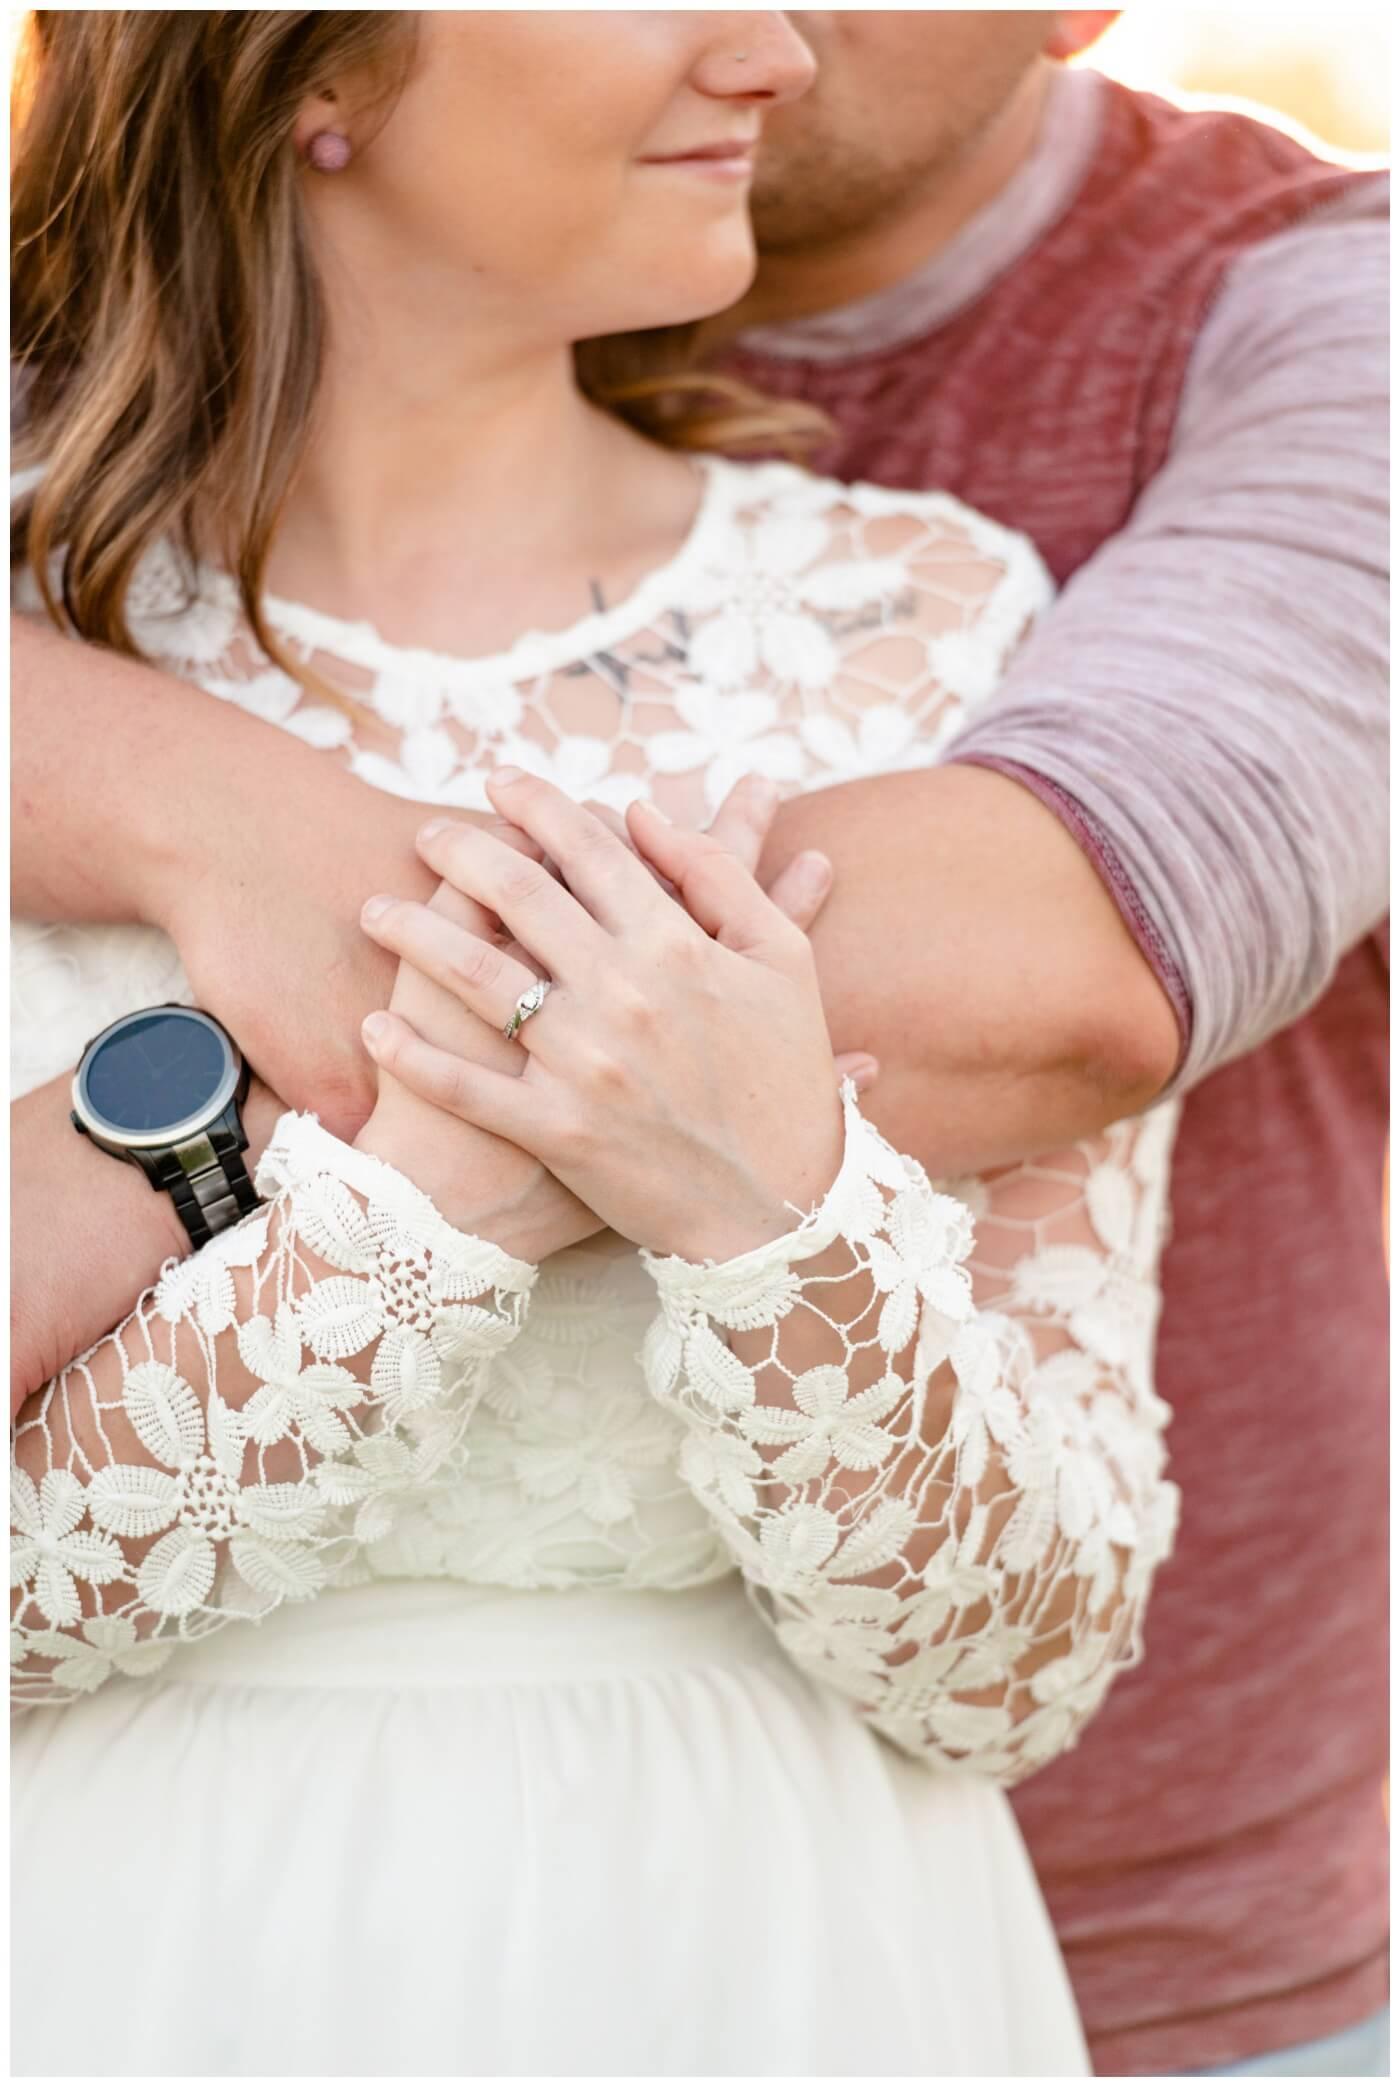 Jon & Callie – Engagement